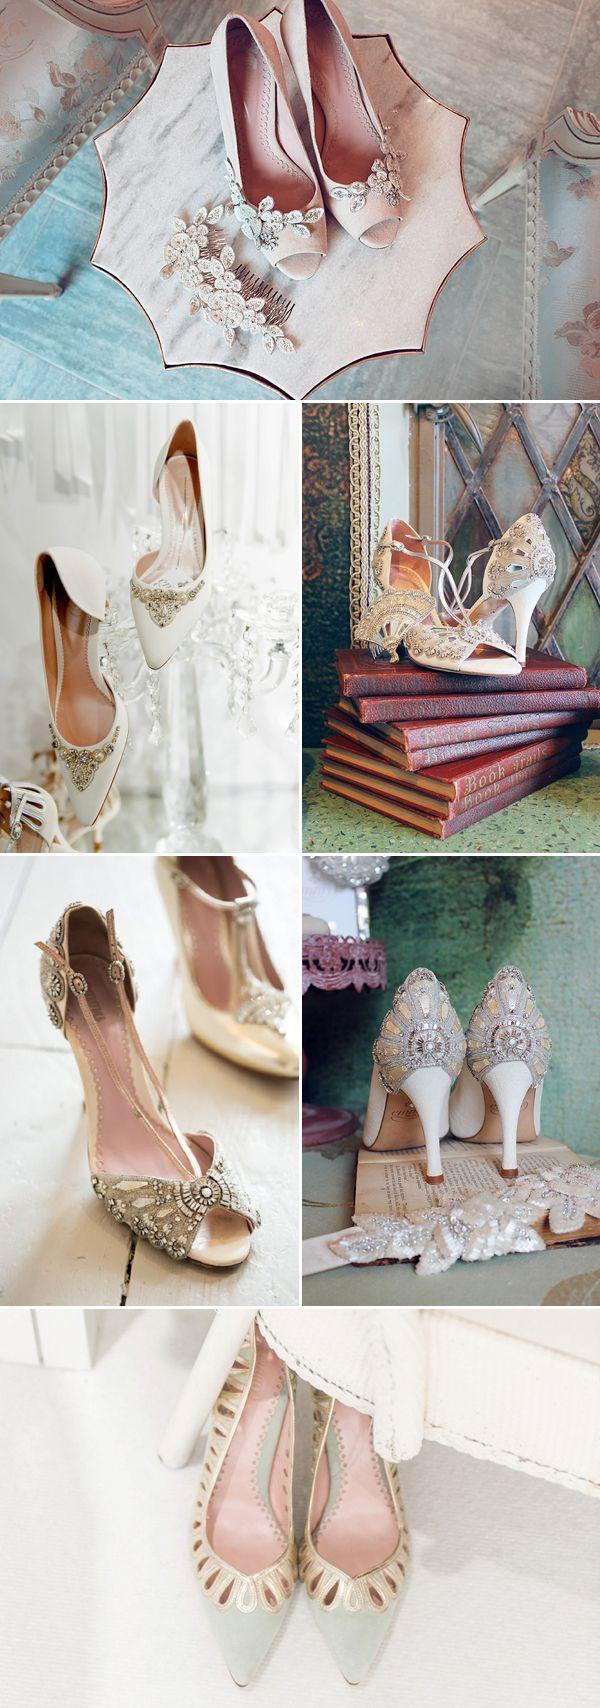 best 25+ designer wedding shoes ideas on pinterest | wedding heels